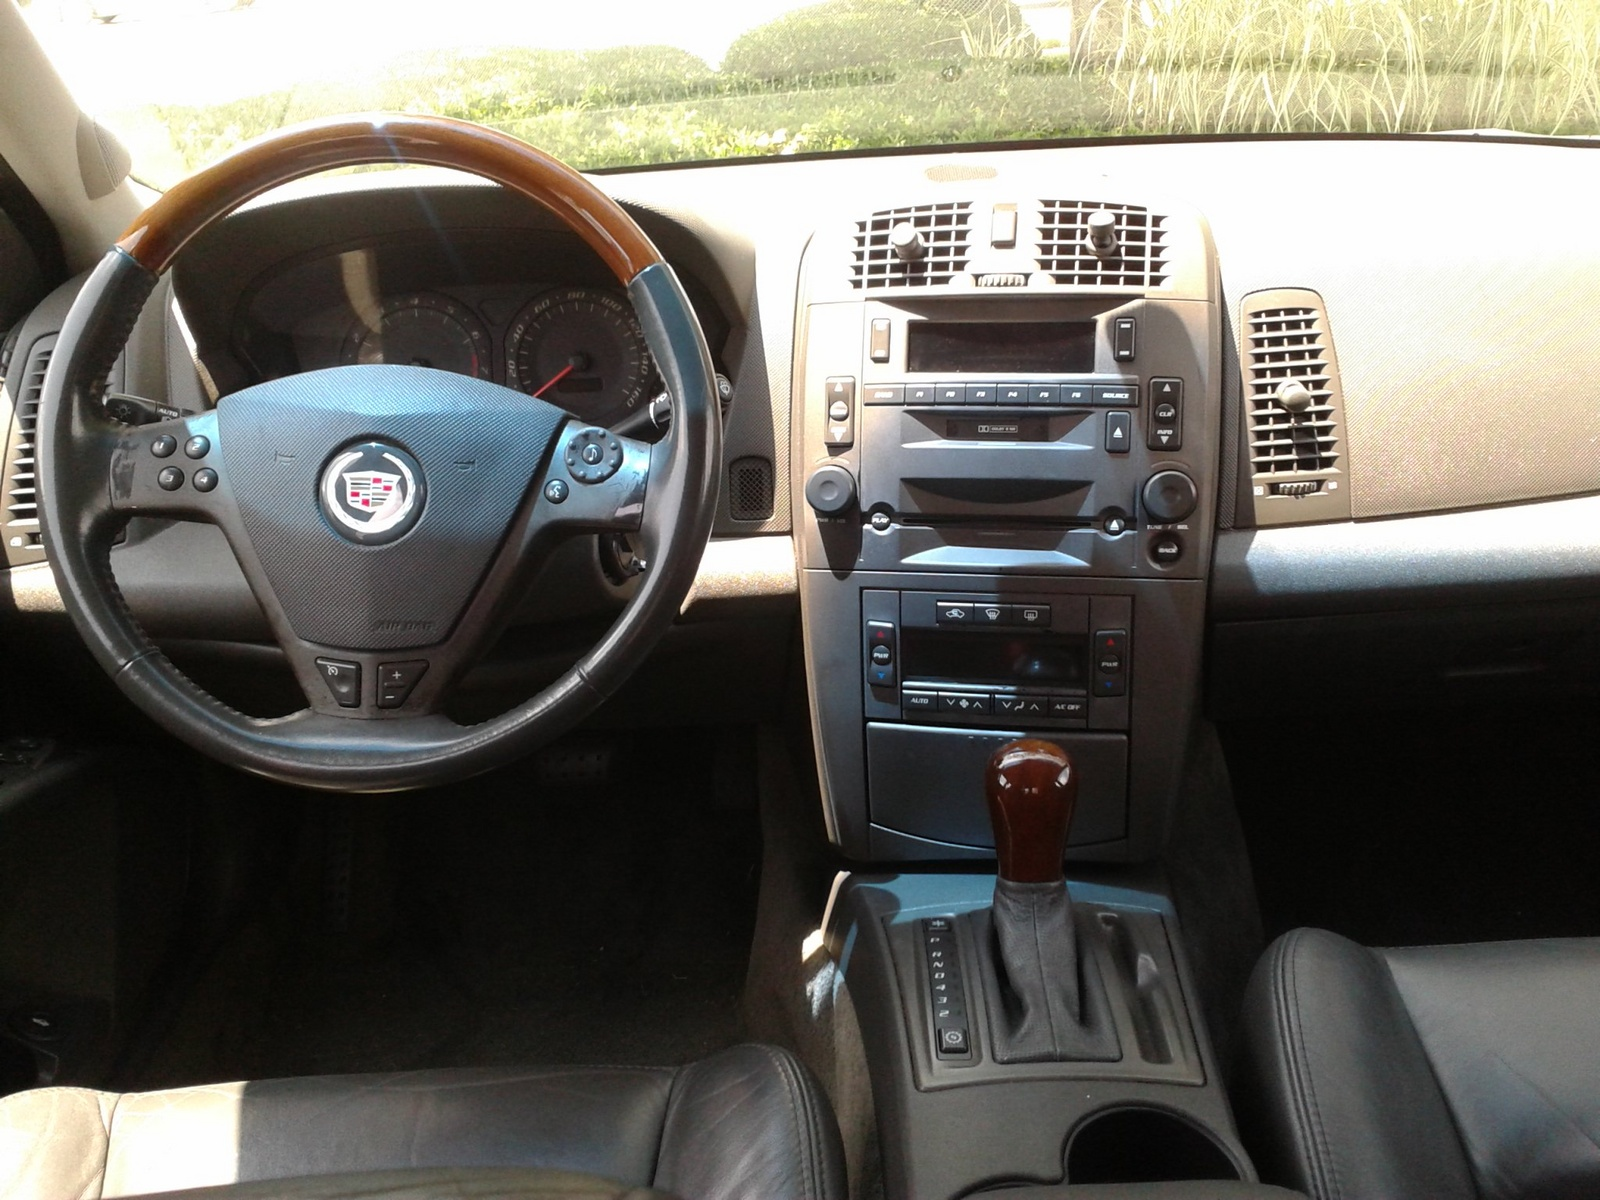 2016 Cadillac Escalade Interior >> 2003 Cadillac CTS - Interior Pictures - CarGurus